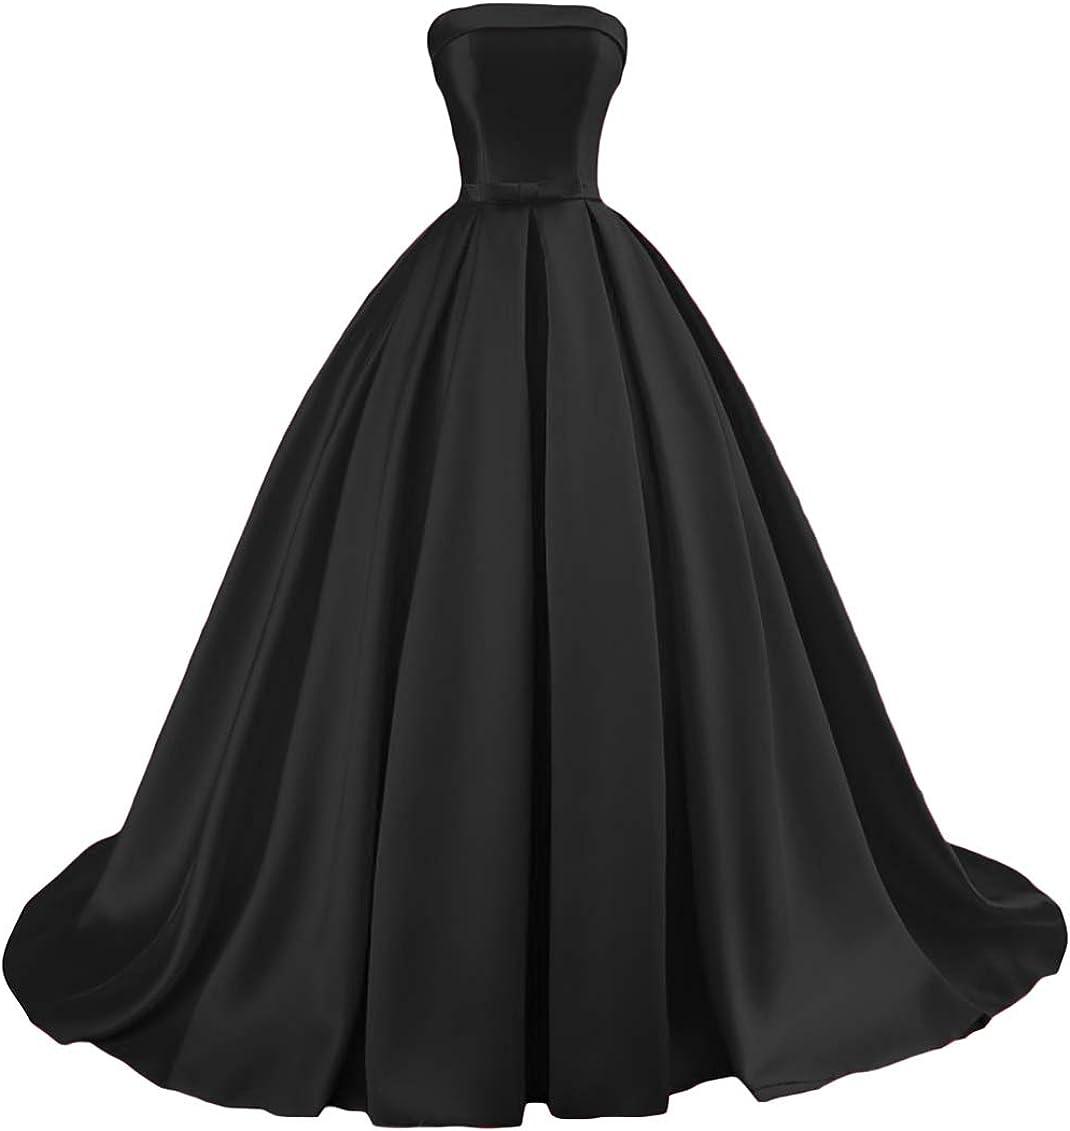 Amazon Com Dymaisei Women S Strapless Prom Dress 2020 Long Ball Gowns Evening Formal Wedding Dress Clothing